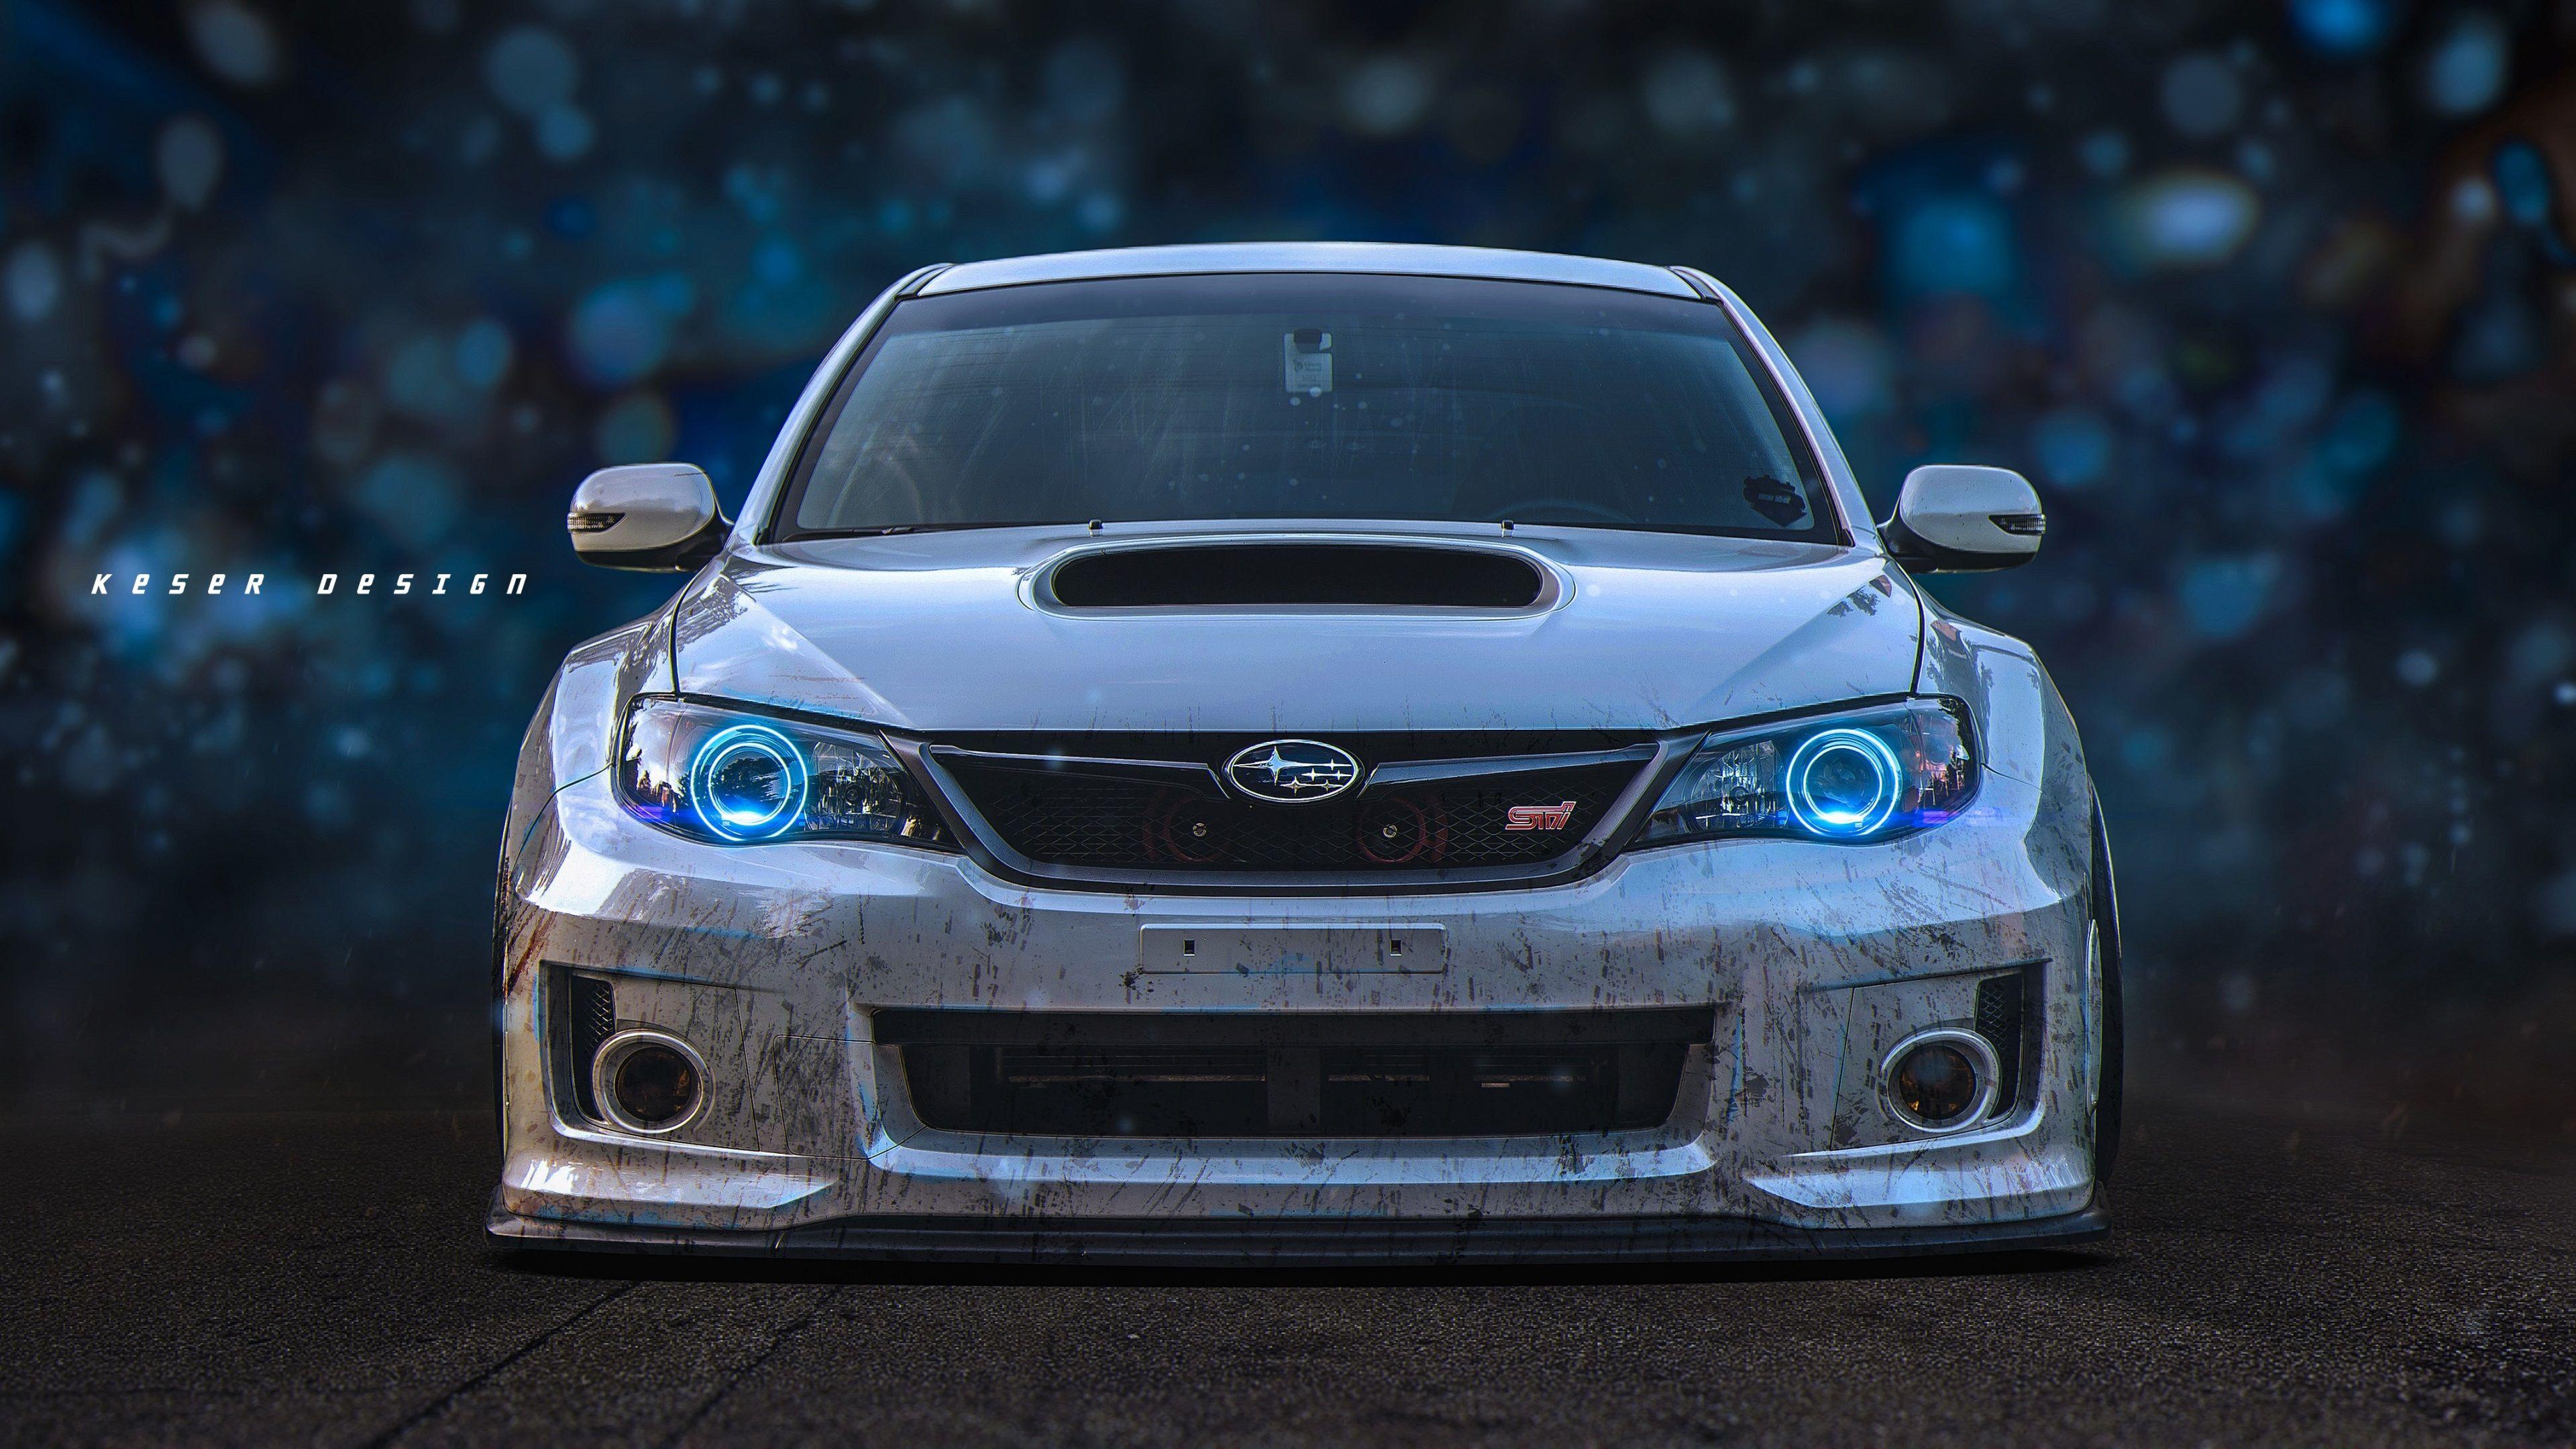 Subaru Sti Hatchback 2021 Configurations In 2020 Subaru Wrx Hatchback Wrx Subaru Wrx